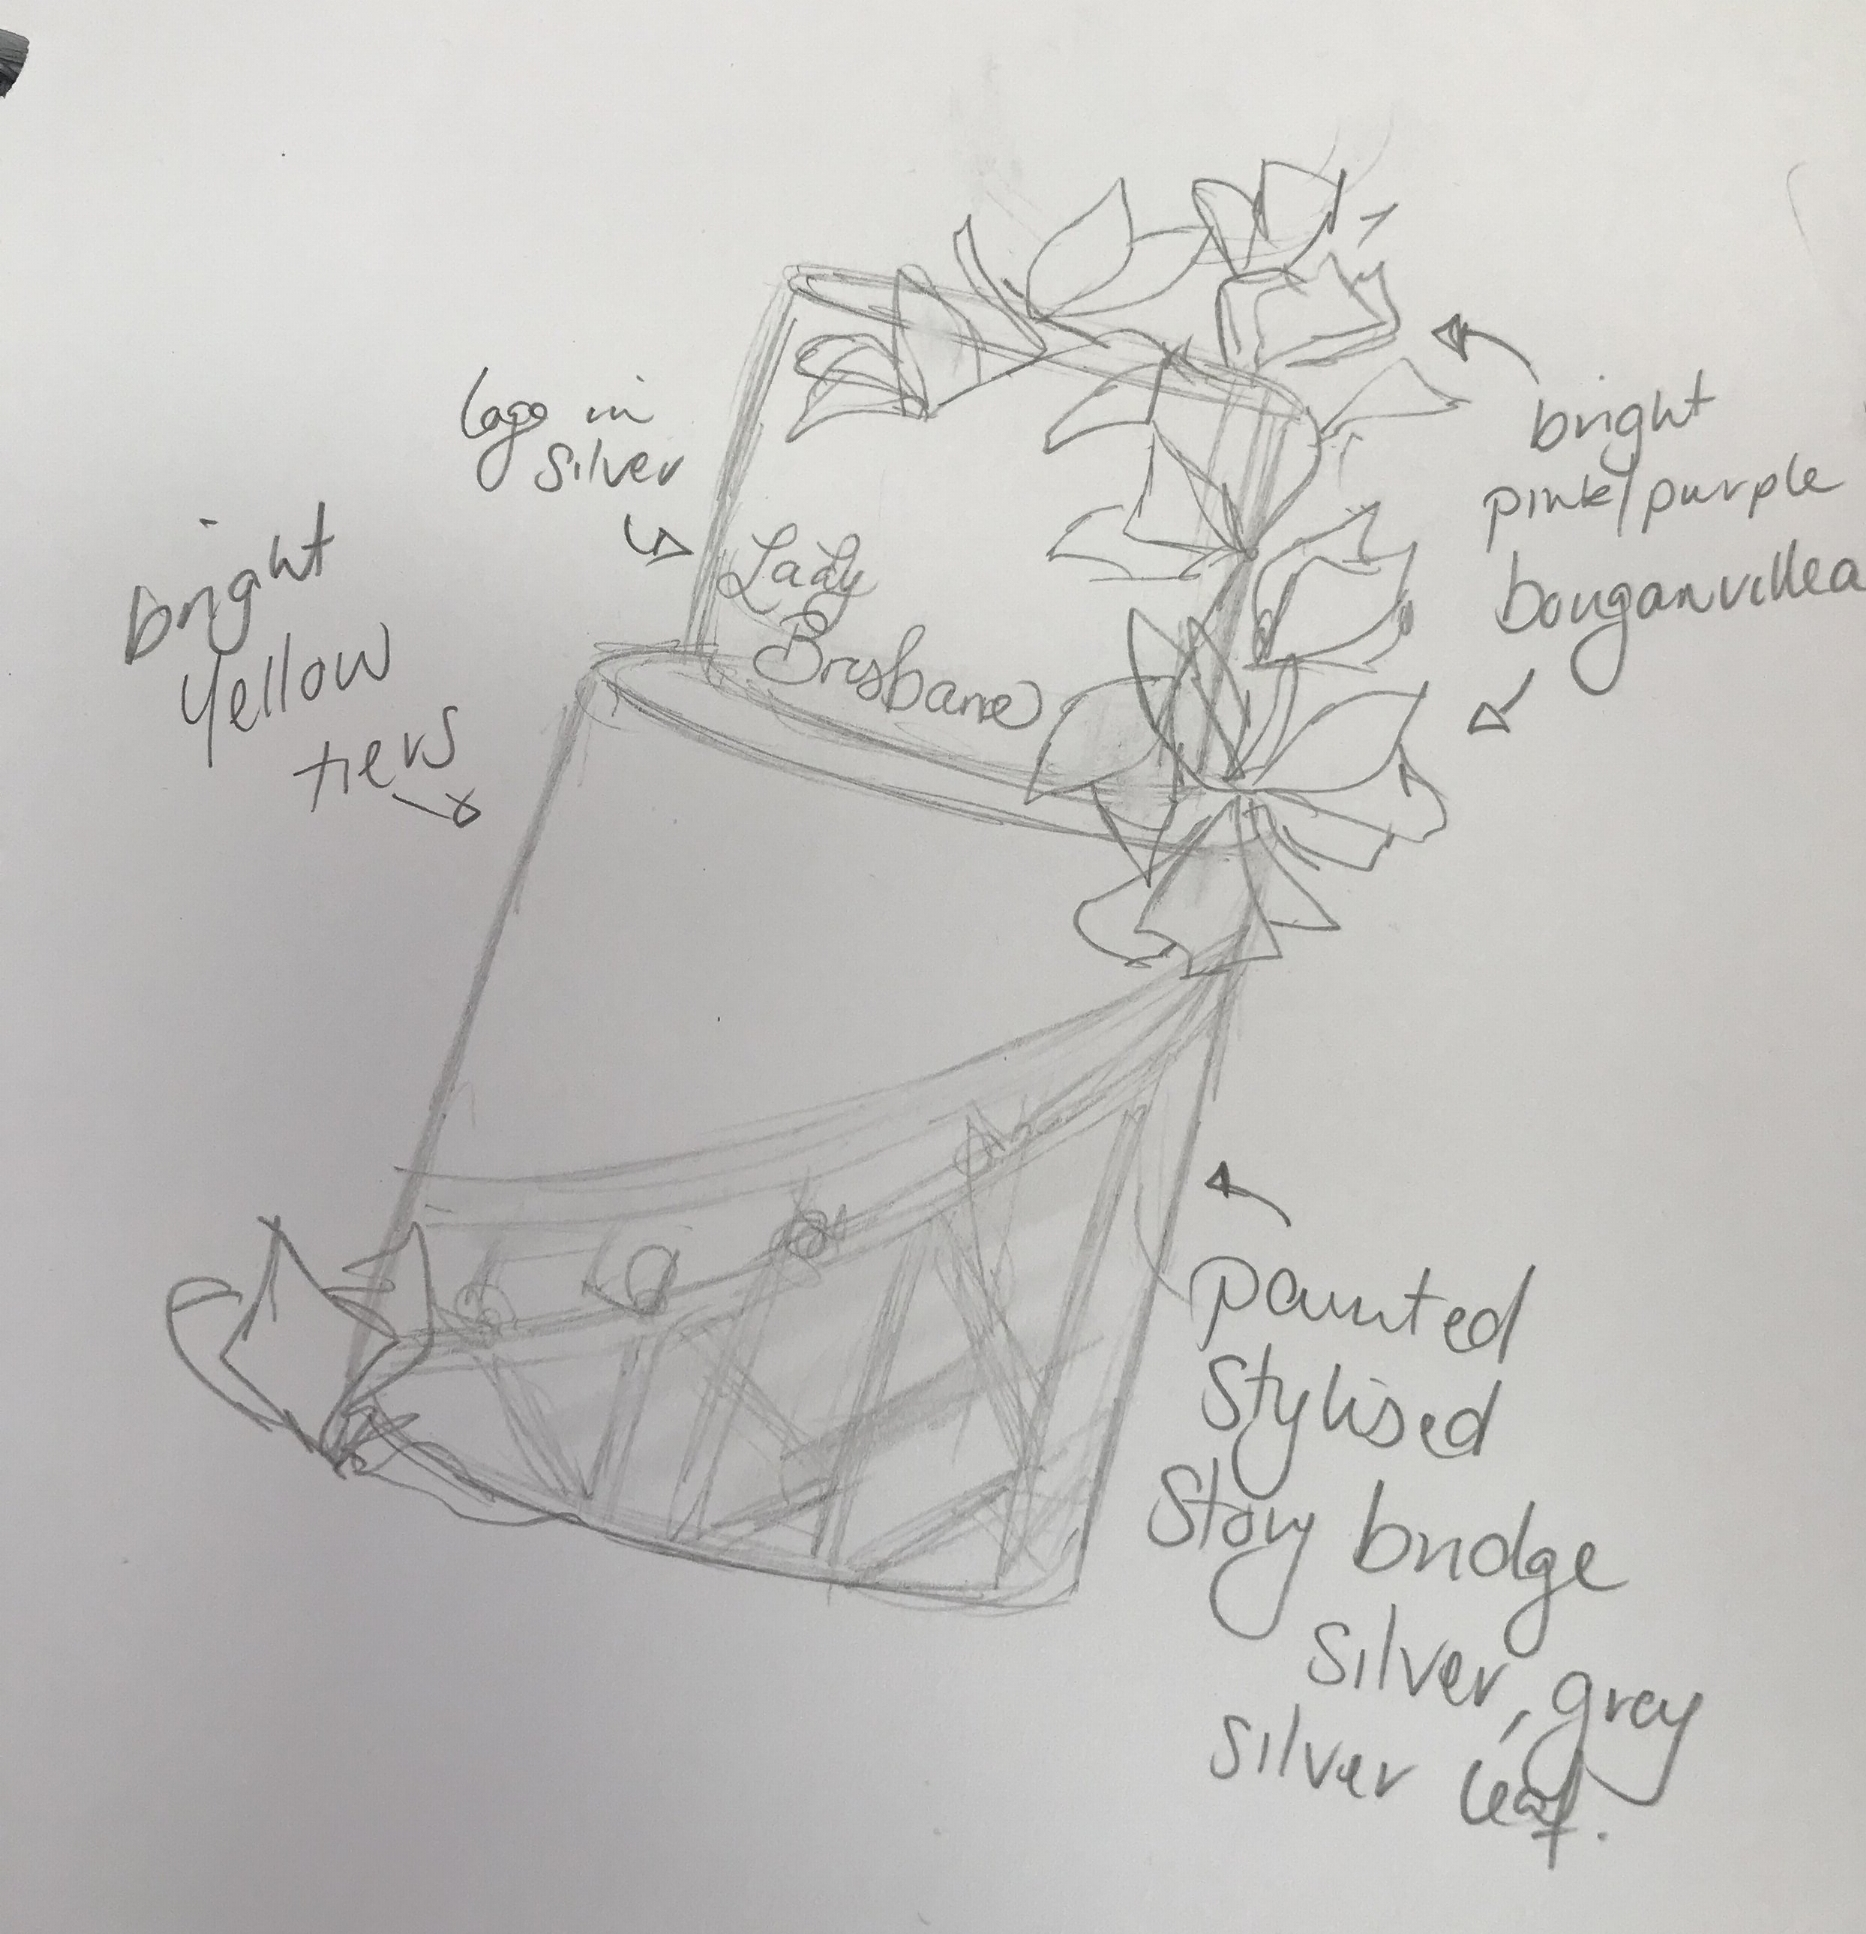 Zoe's sketch of her cake design